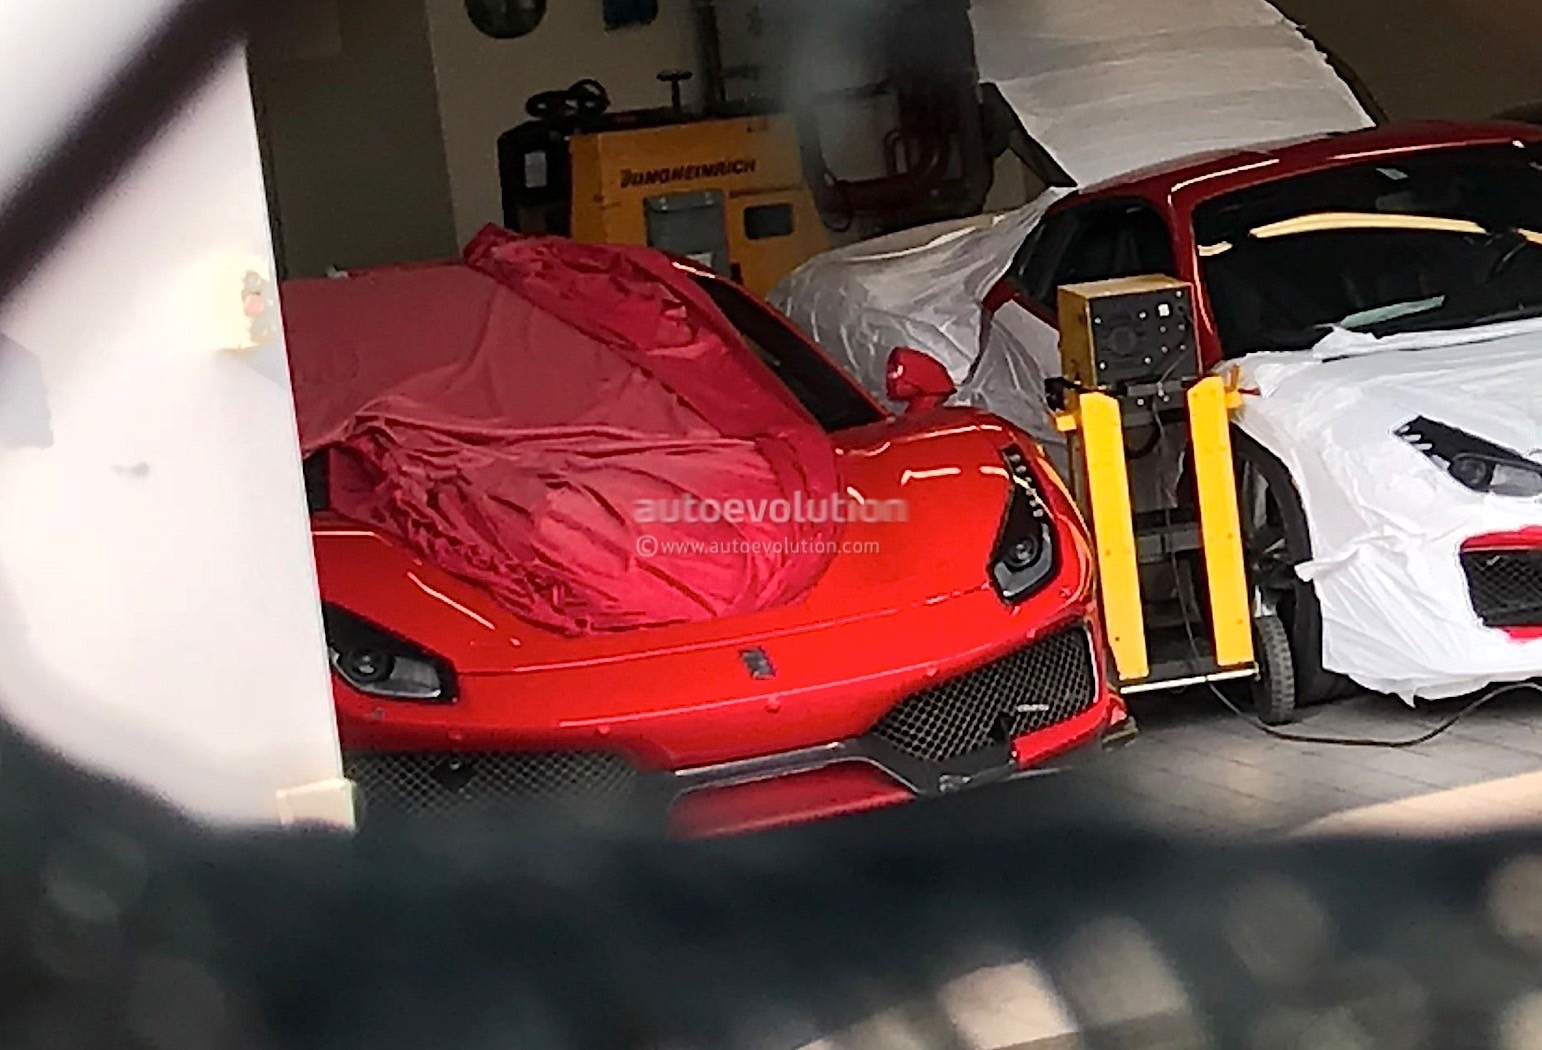 2019 Ferrari 488 GTO Spied, Uncovered Prototype Reveals